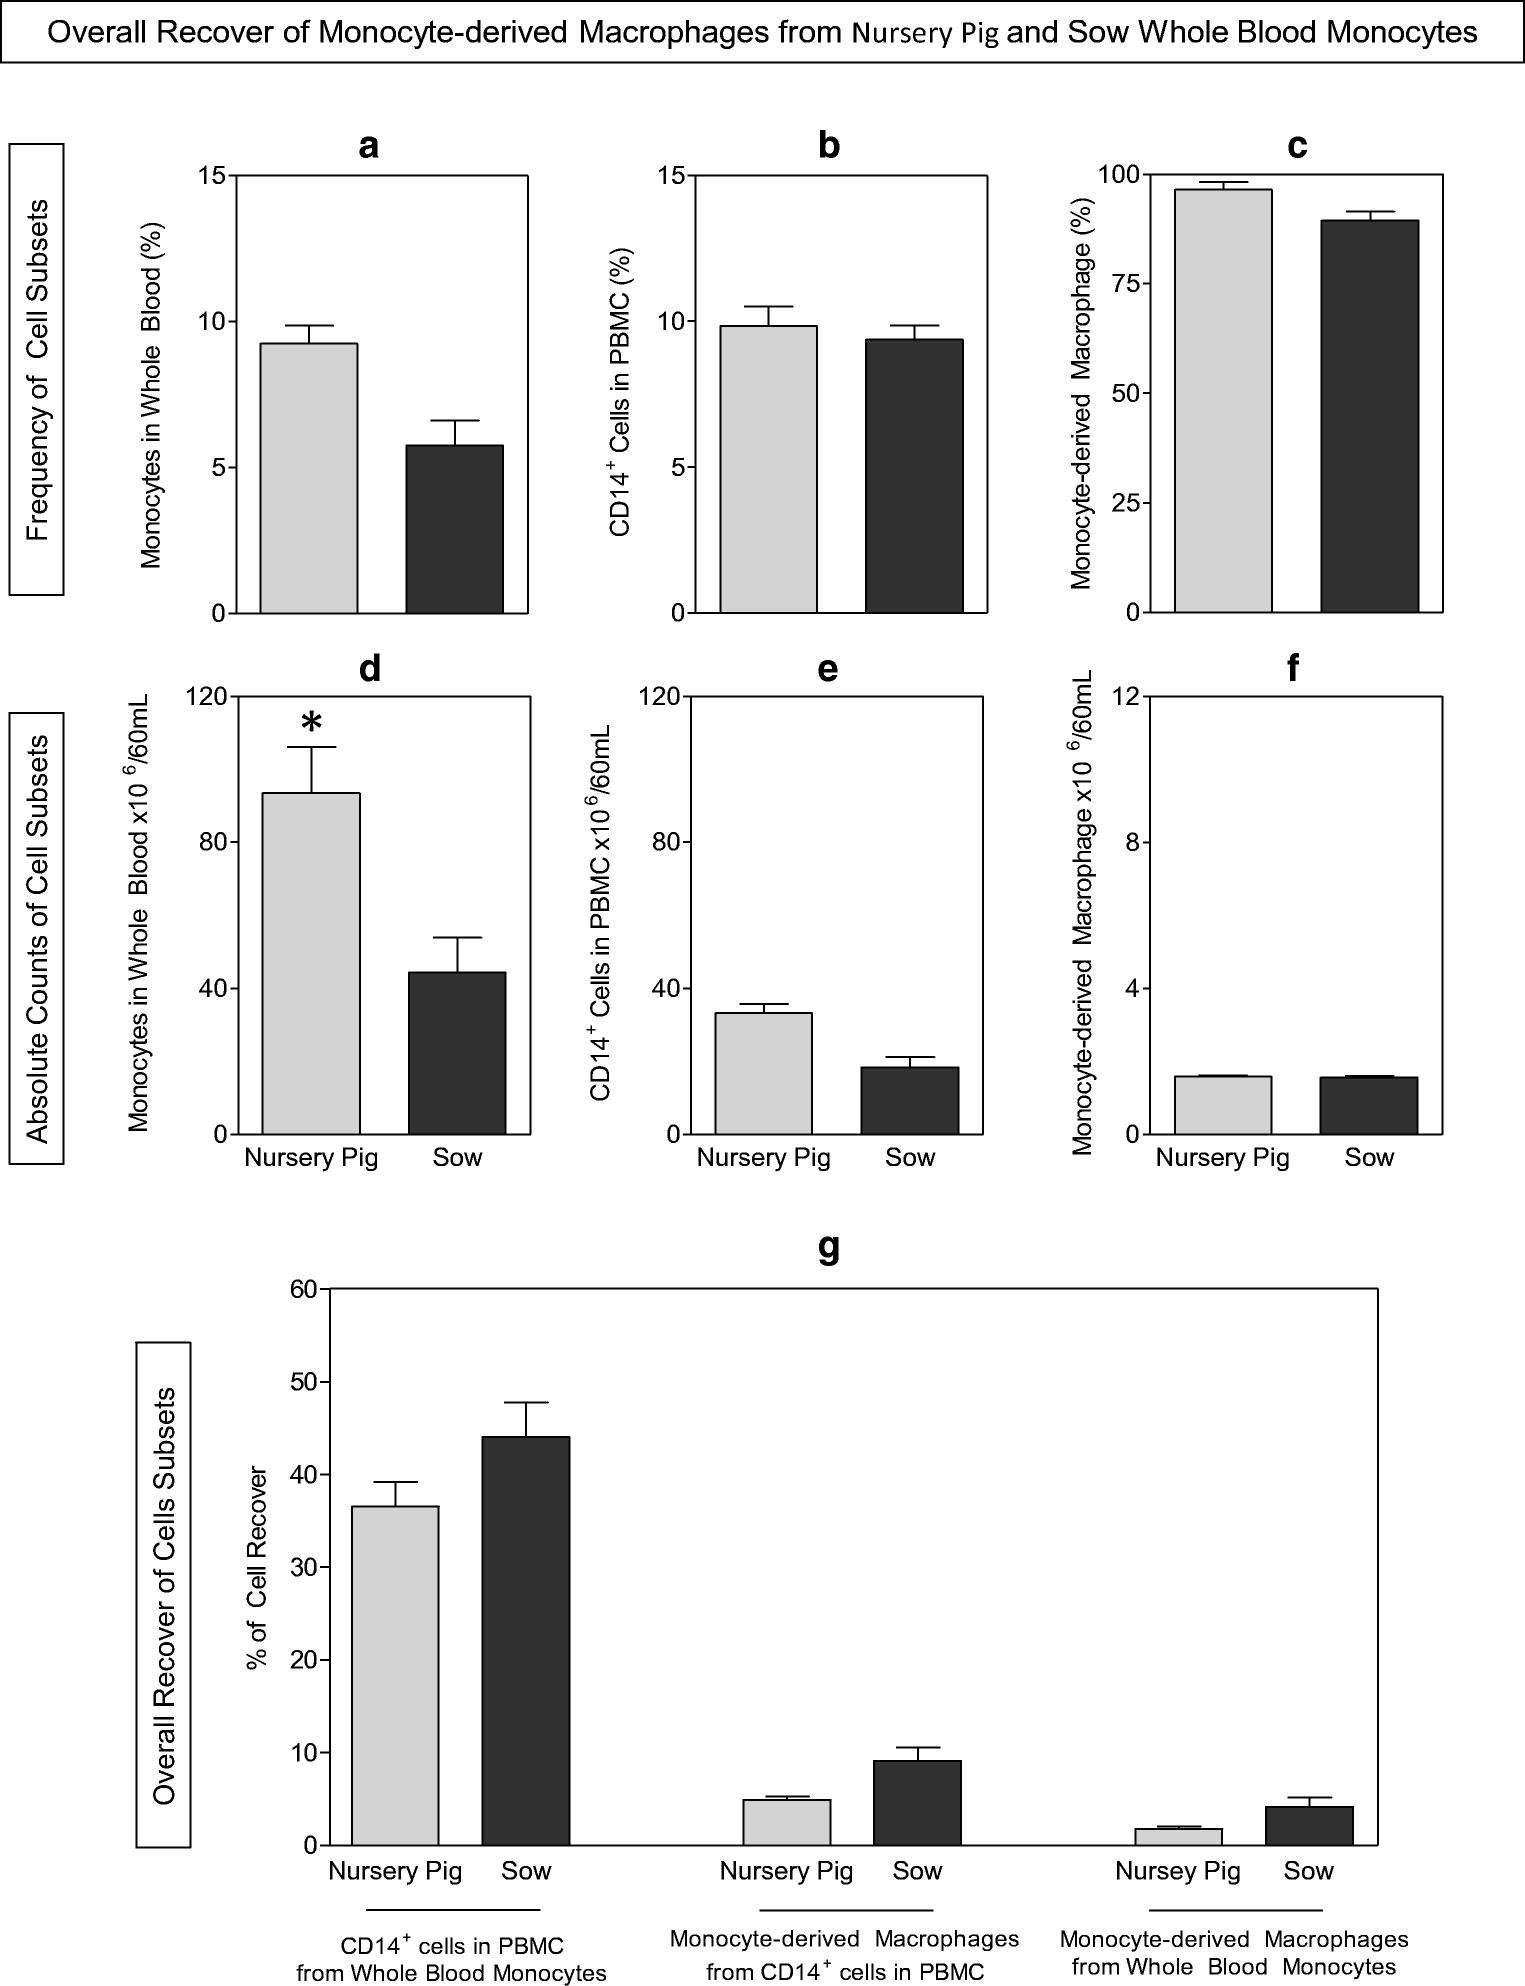 Phenotypic characterization of swine peripheral blood